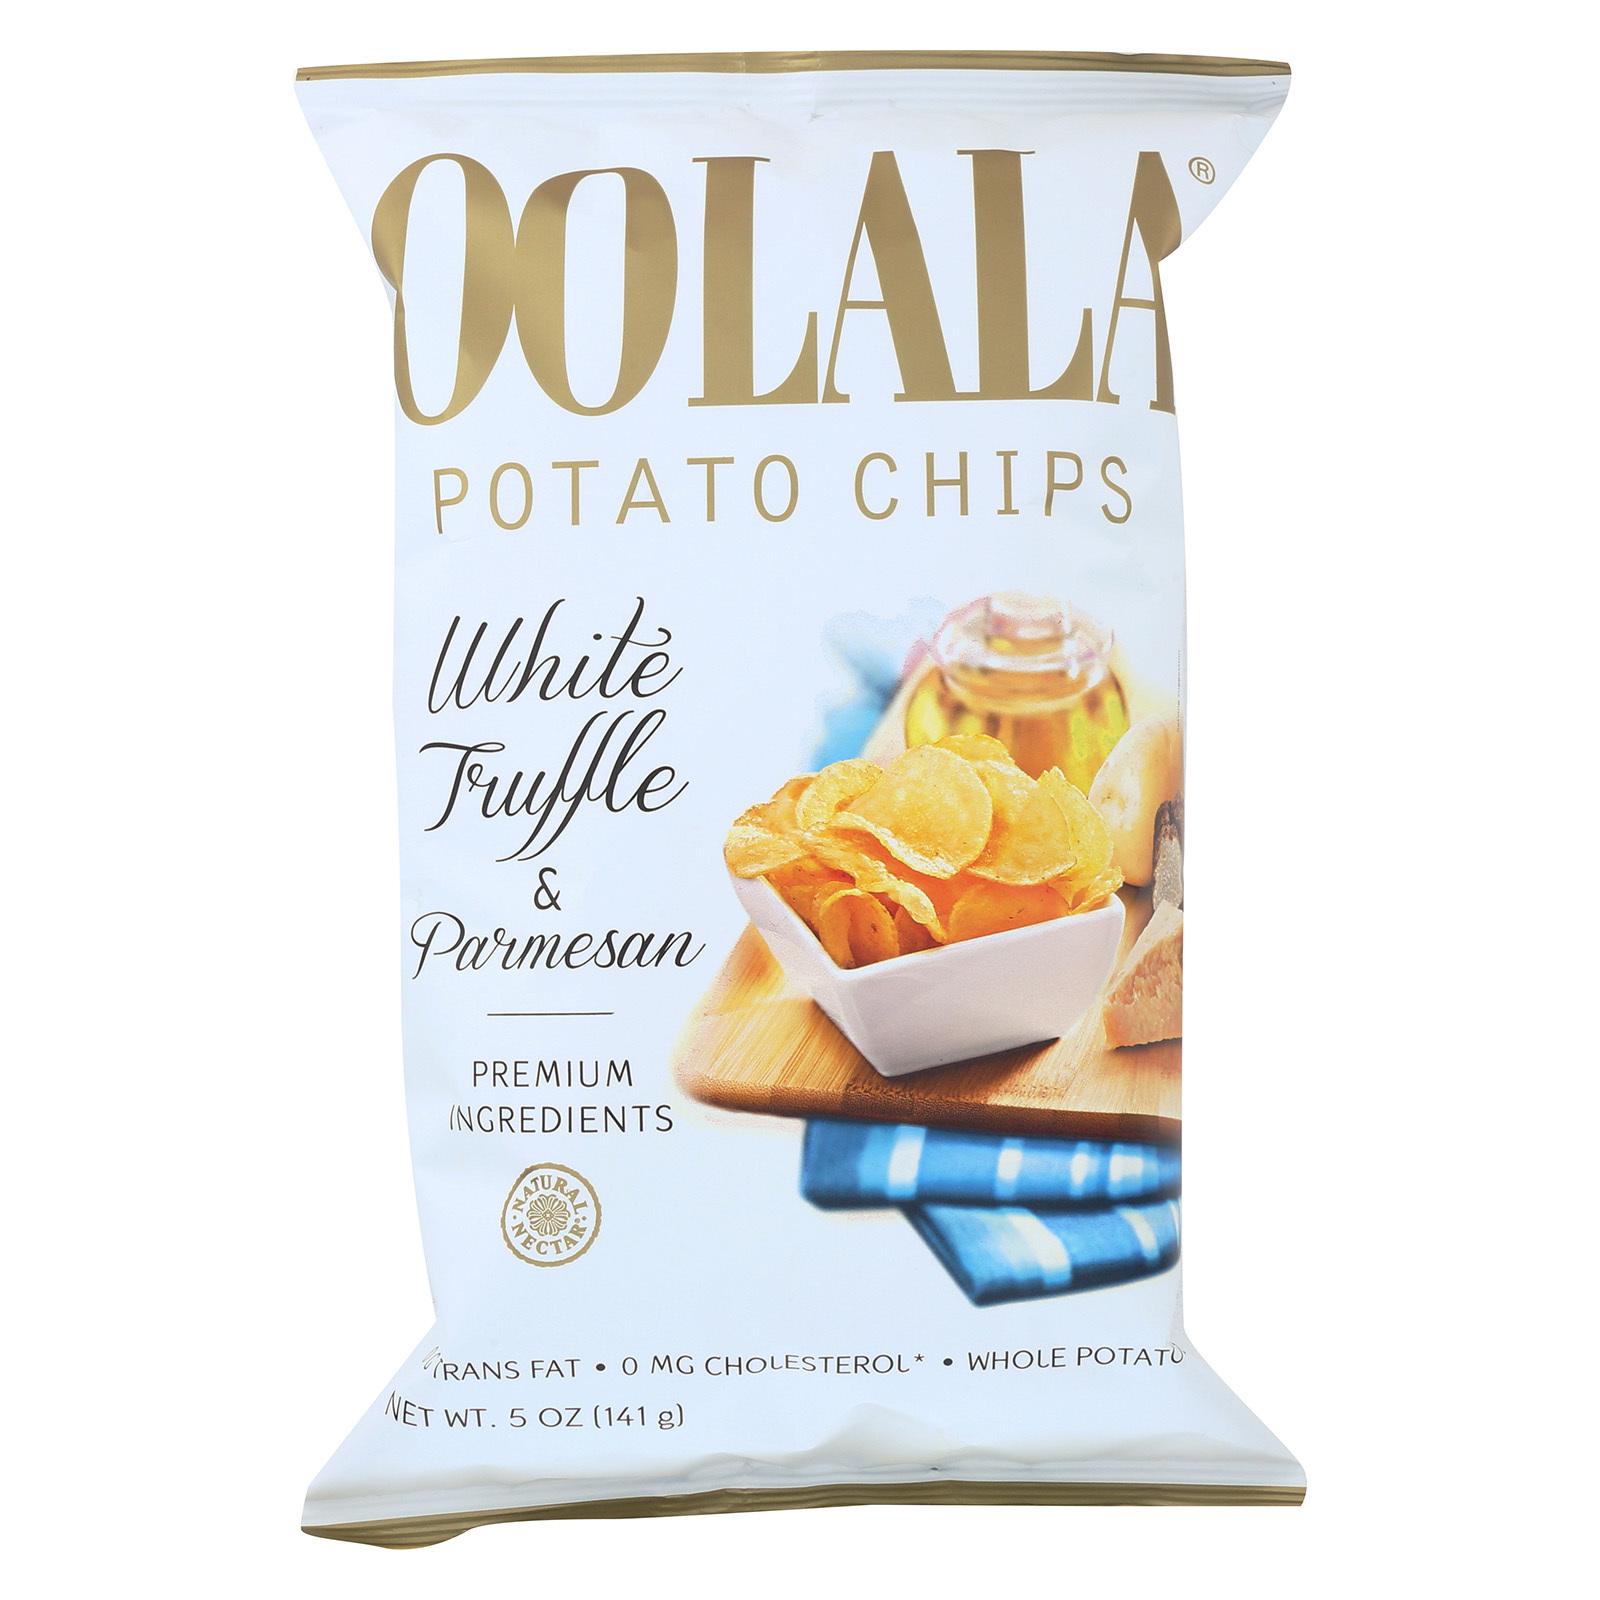 Oolala Potato Chips - White Truffle and Parmesan - Case of 9 - 5 oz.